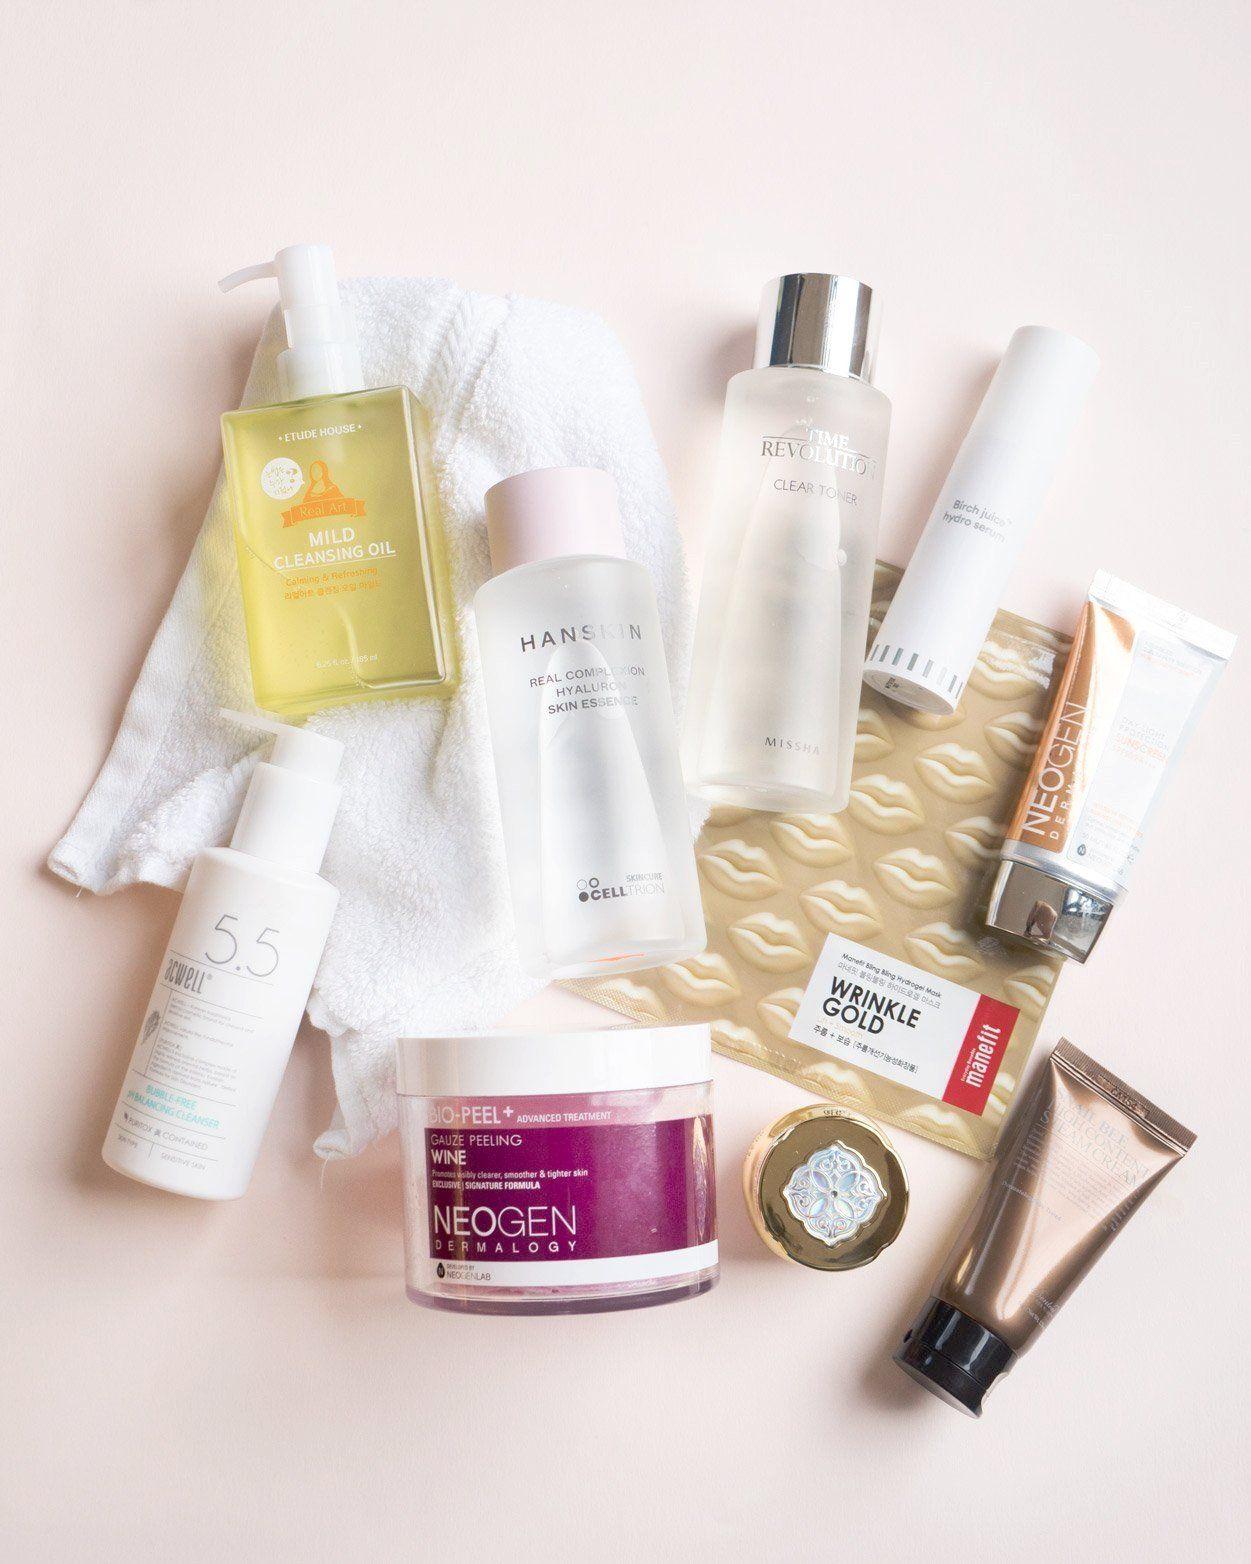 10 Step Korean Skin Care Routine Set For Dry Skin Type In 2020 Korean Skincare Routine Skin Care Routine Steps Diy Skin Care